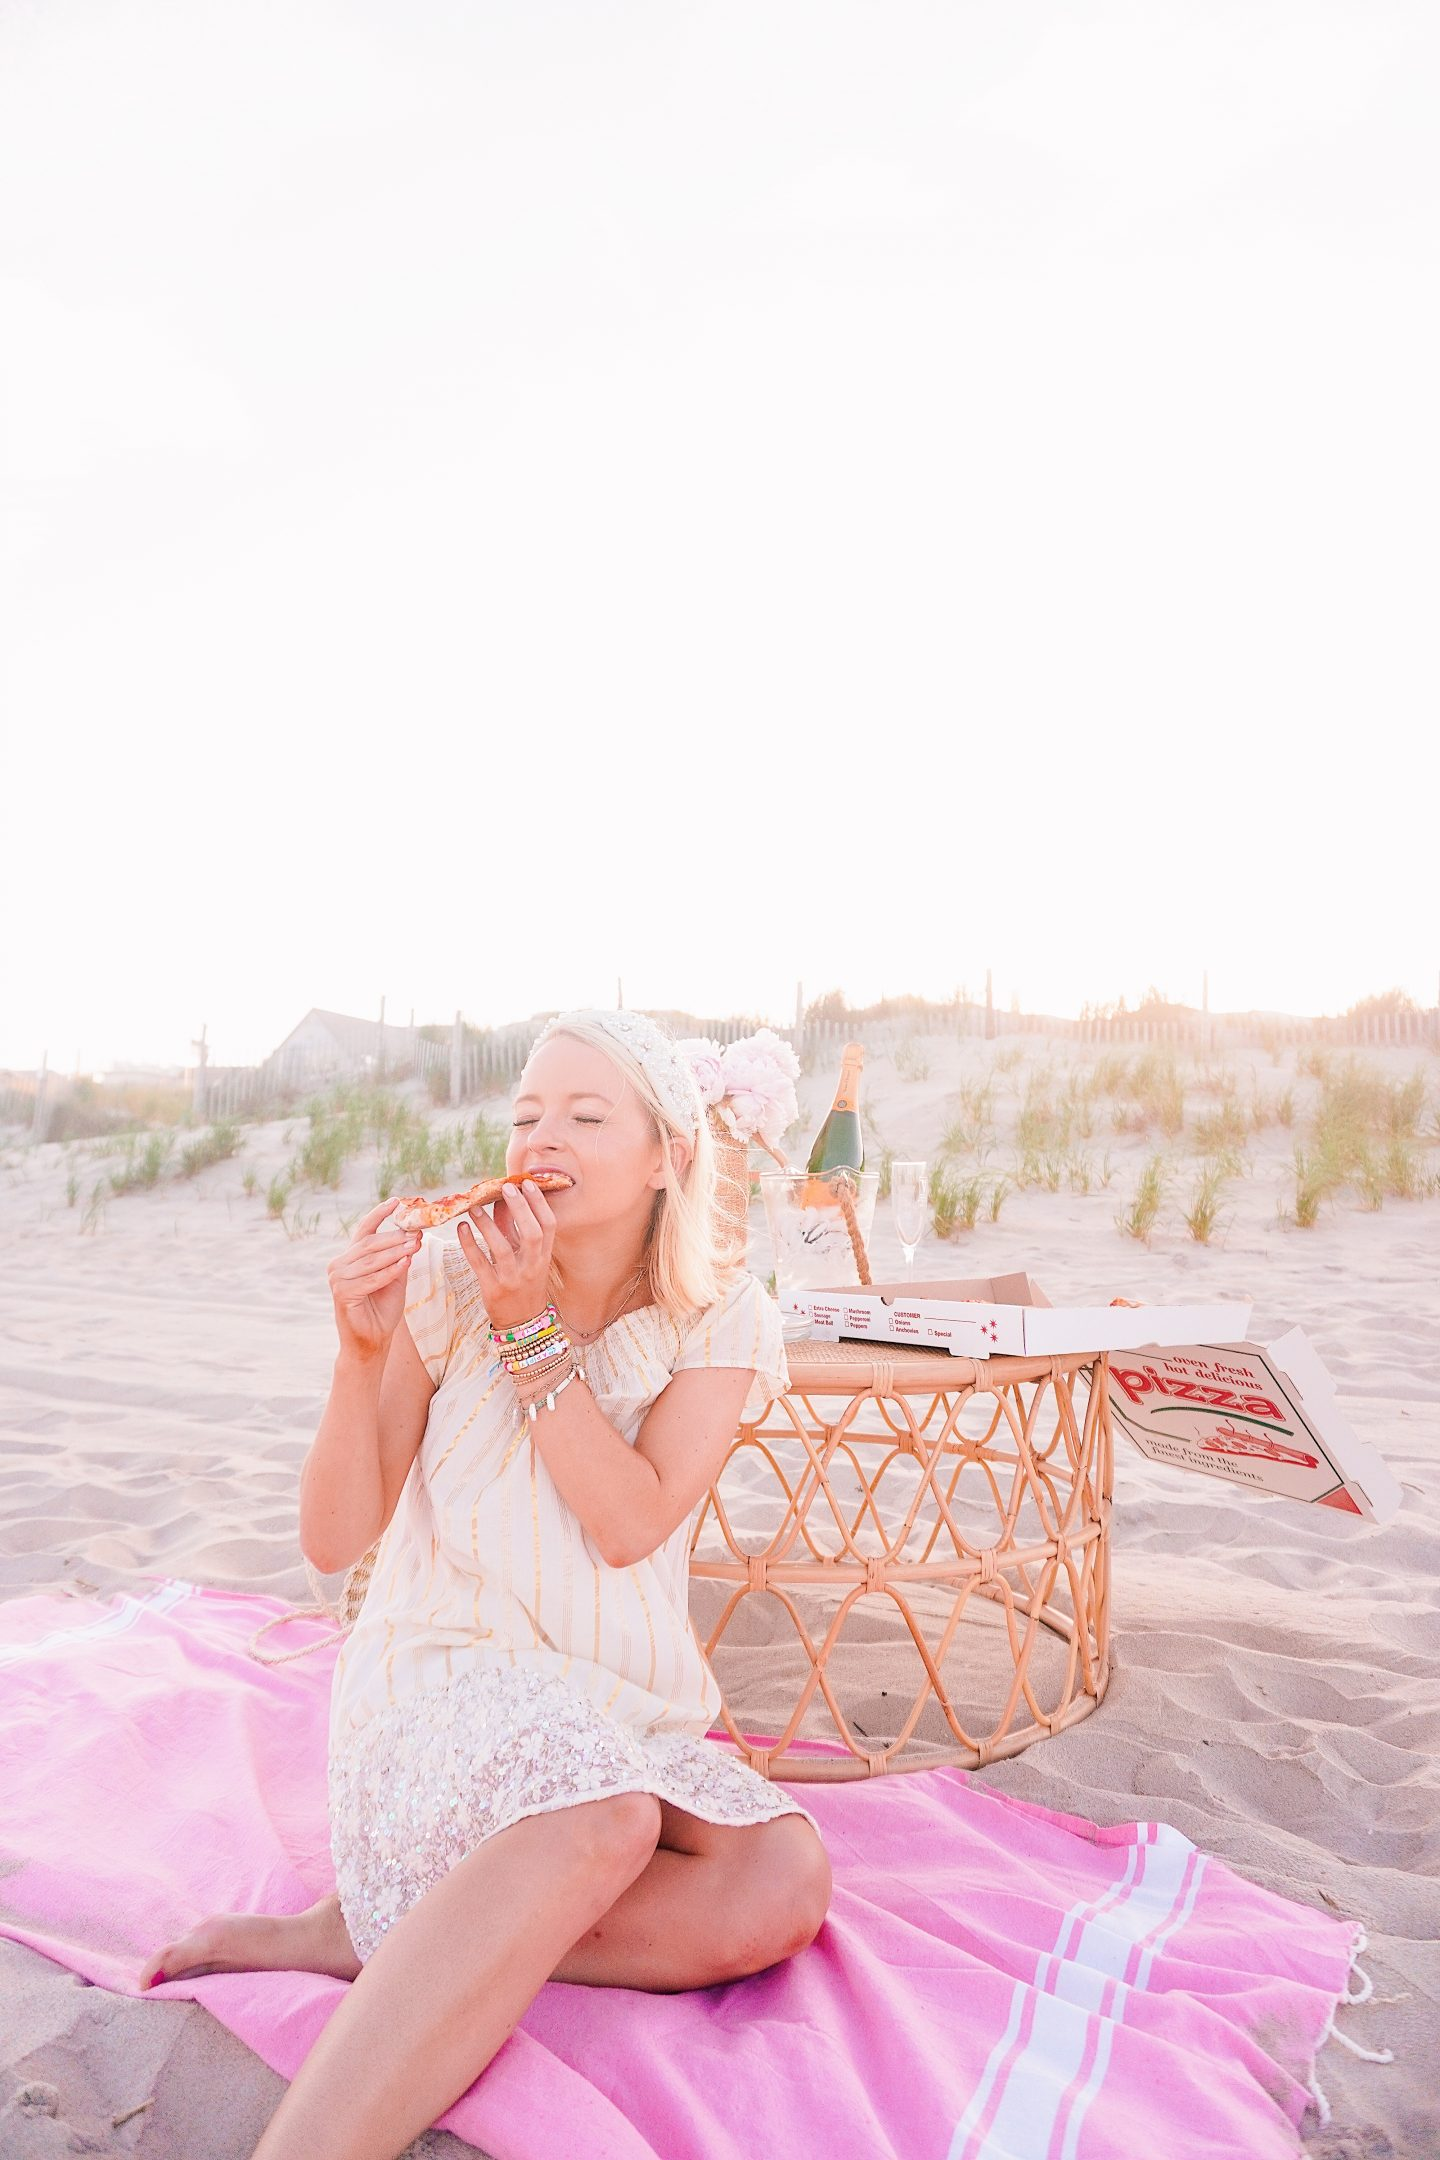 26th birthday beach picnic on Long Beach Island, NJ